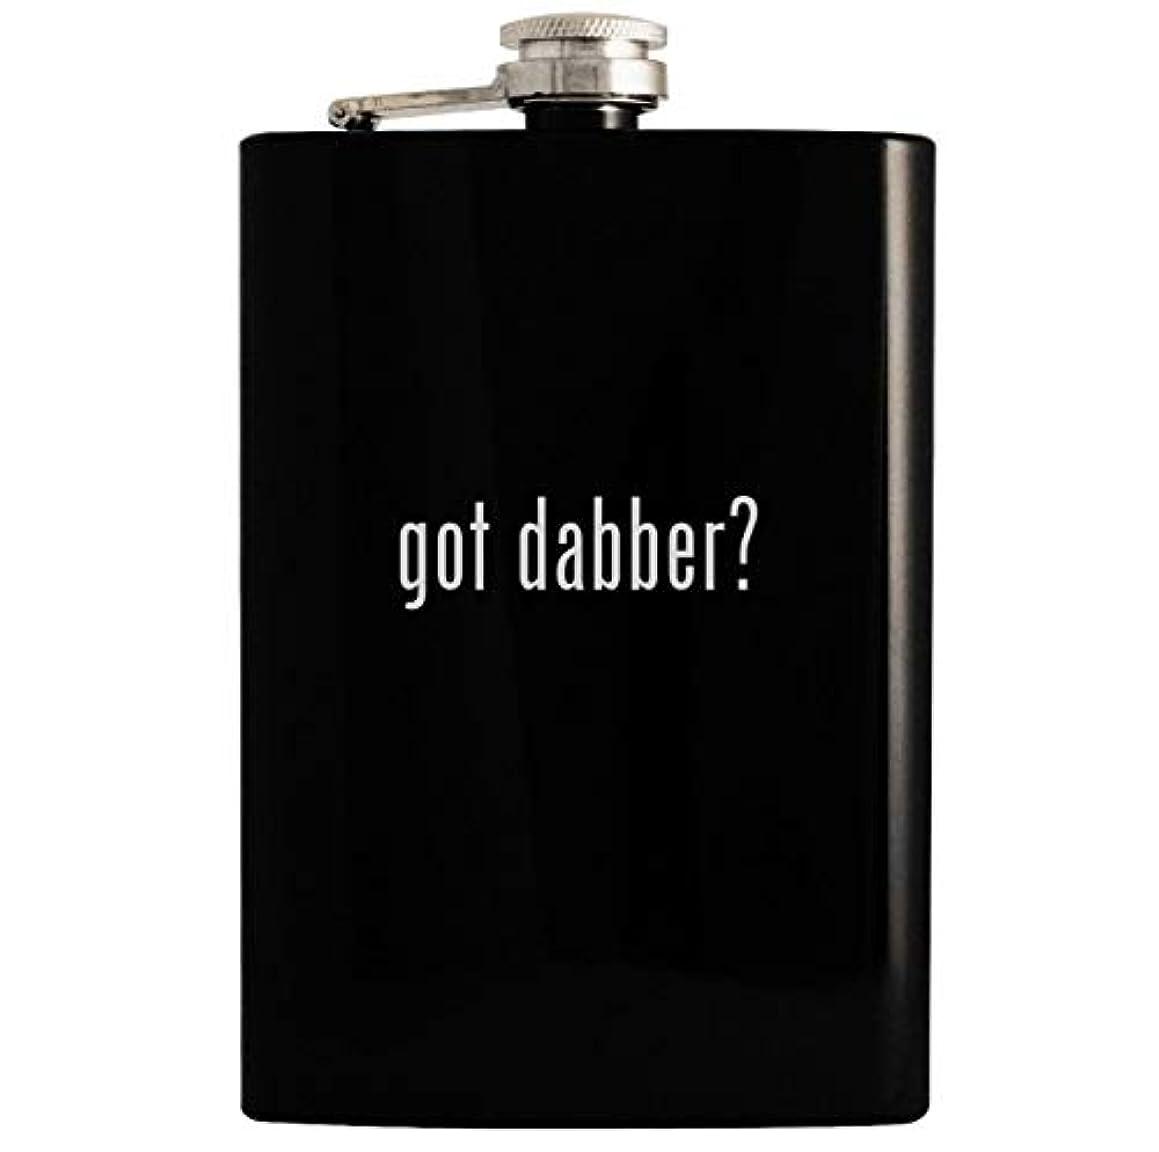 got dabber? - Black 8oz Hip Drinking Alcohol Flask